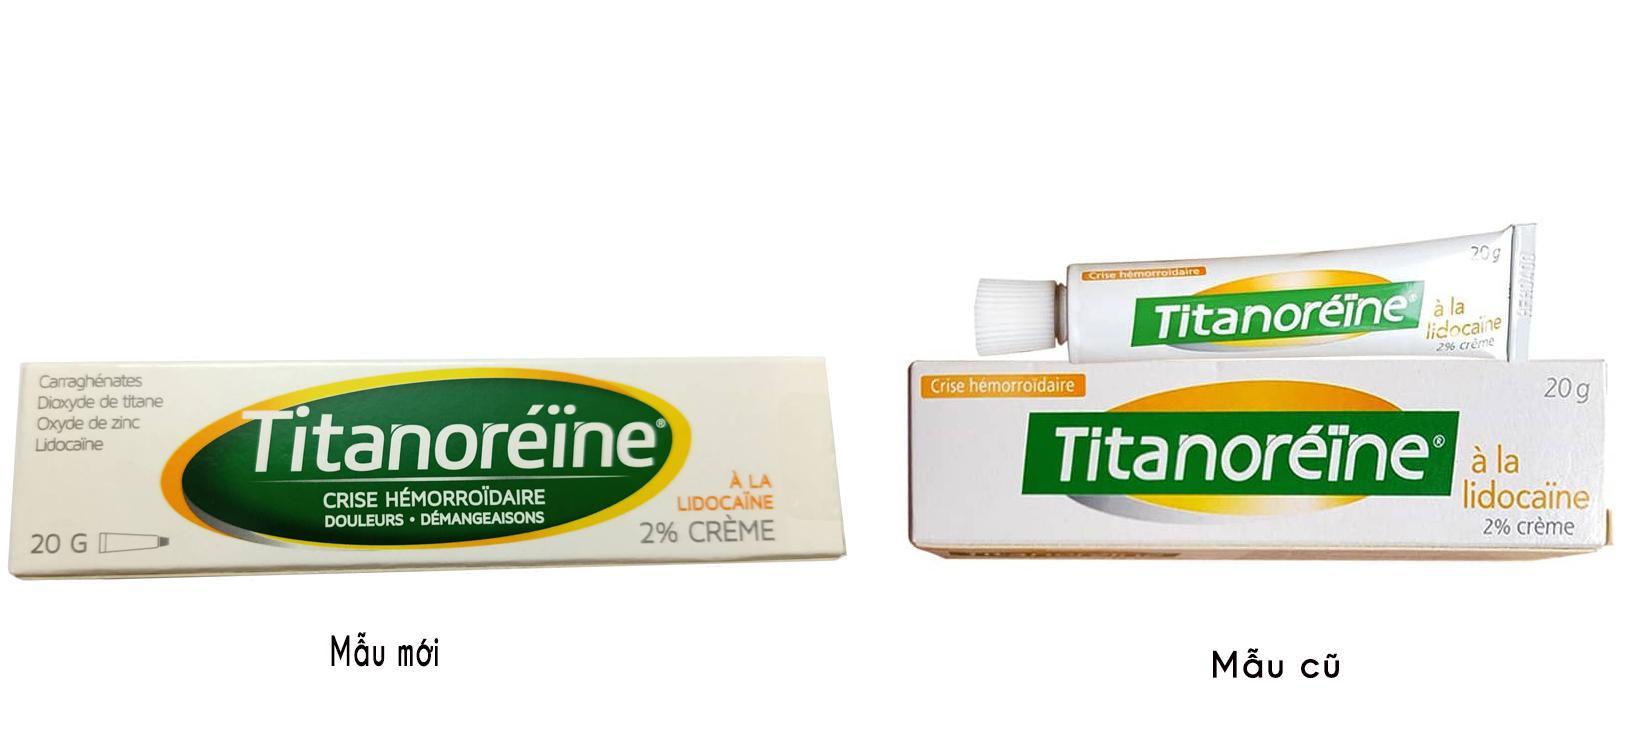 Kem Bôi Titanoreine Của Pháp